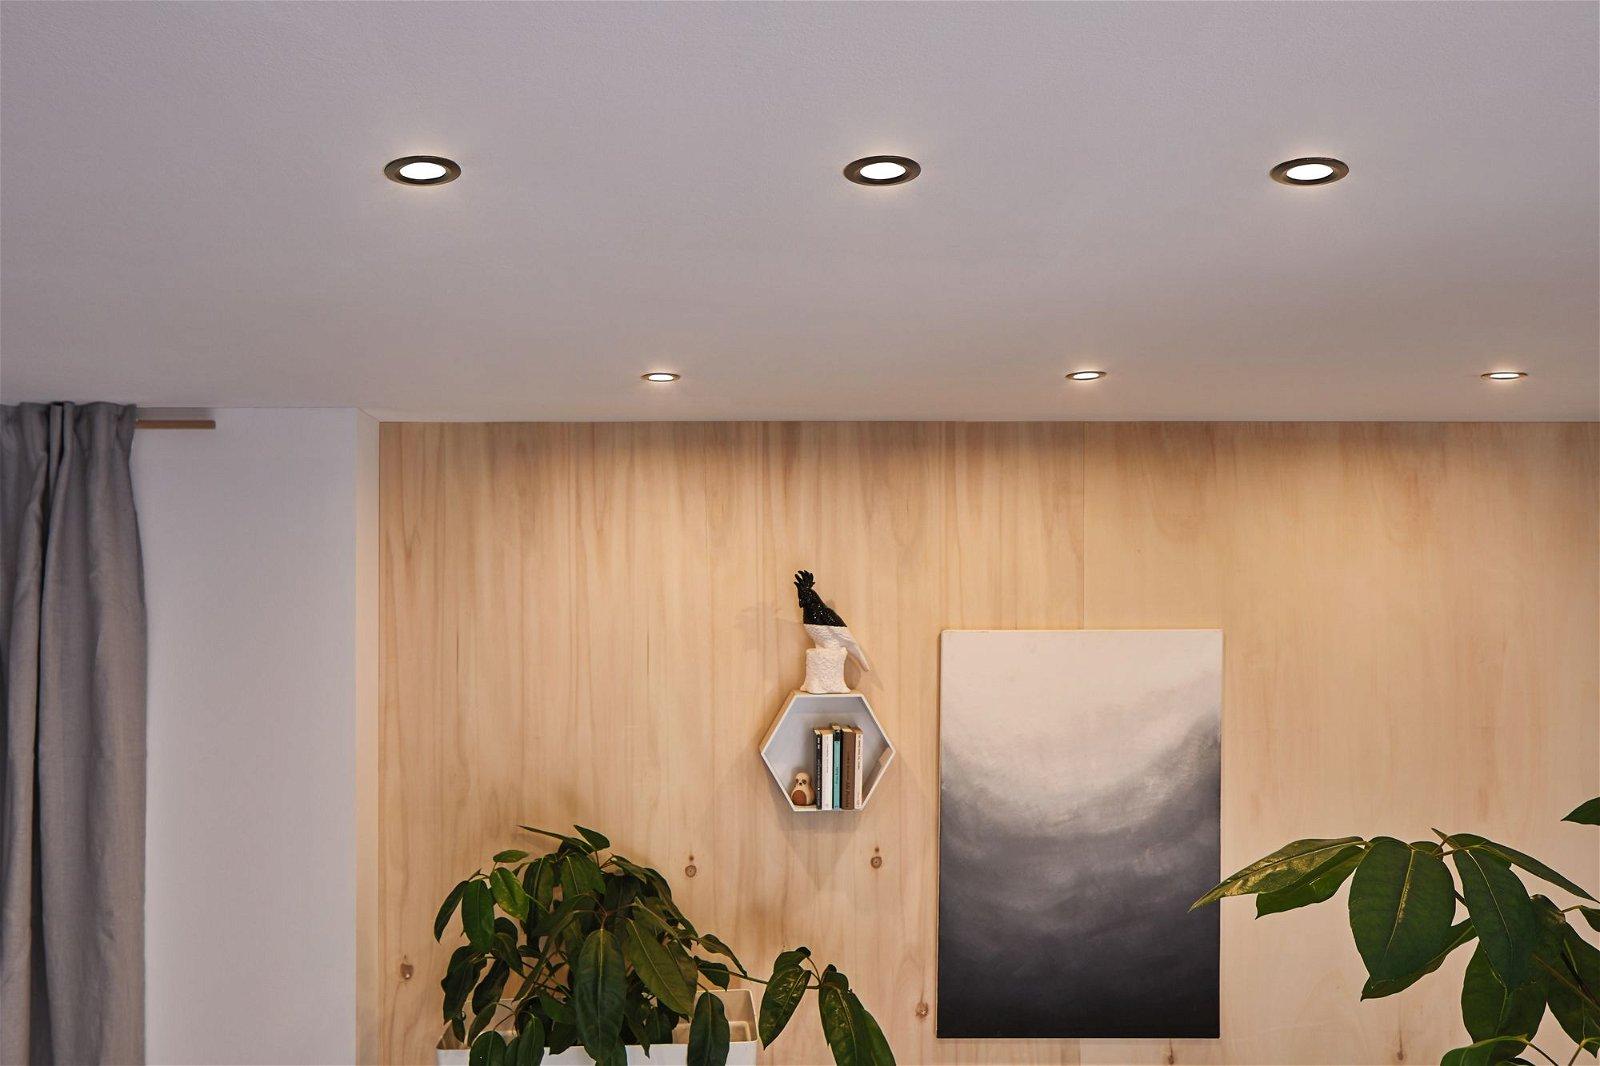 HomeSpa LED-inbouwlamp Calla Basisset zwenkbaar IP65 rond 90mm 3x6,5W 3x680lm 230V 4000K Zwart mat